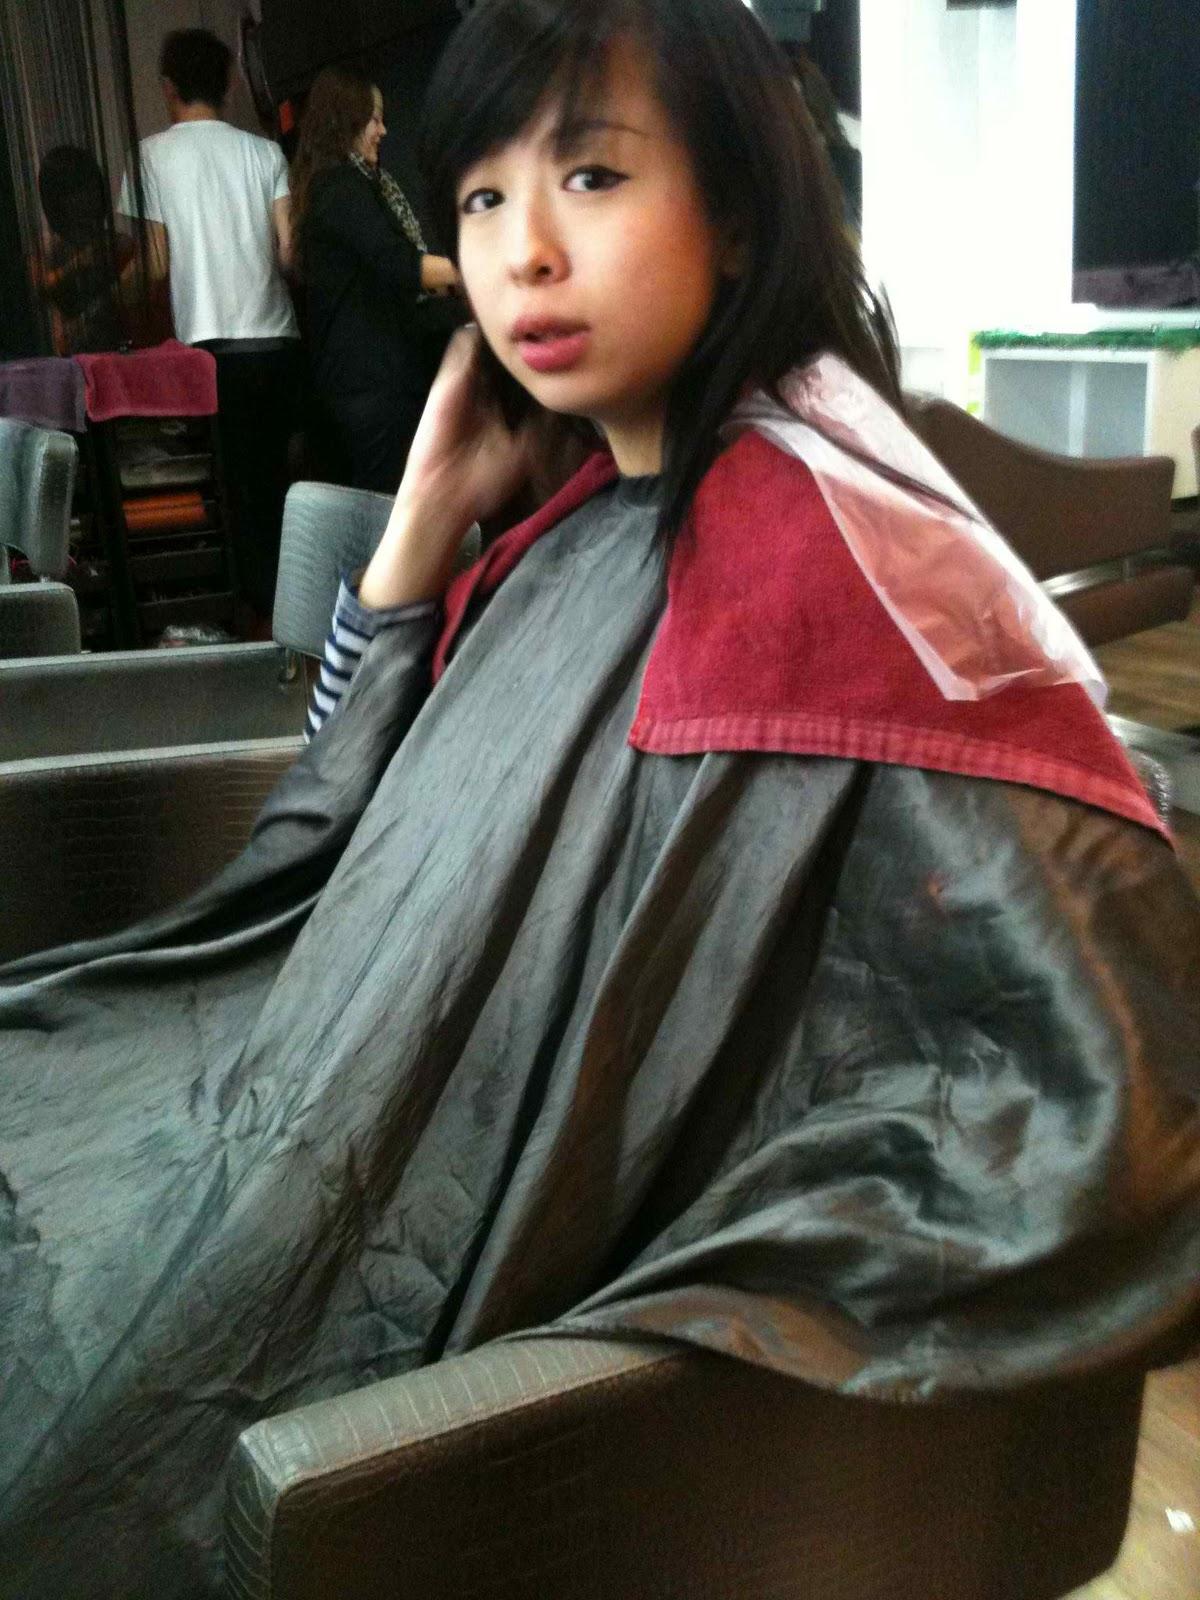 Hair Dye And Pregnancy Kelynnstory